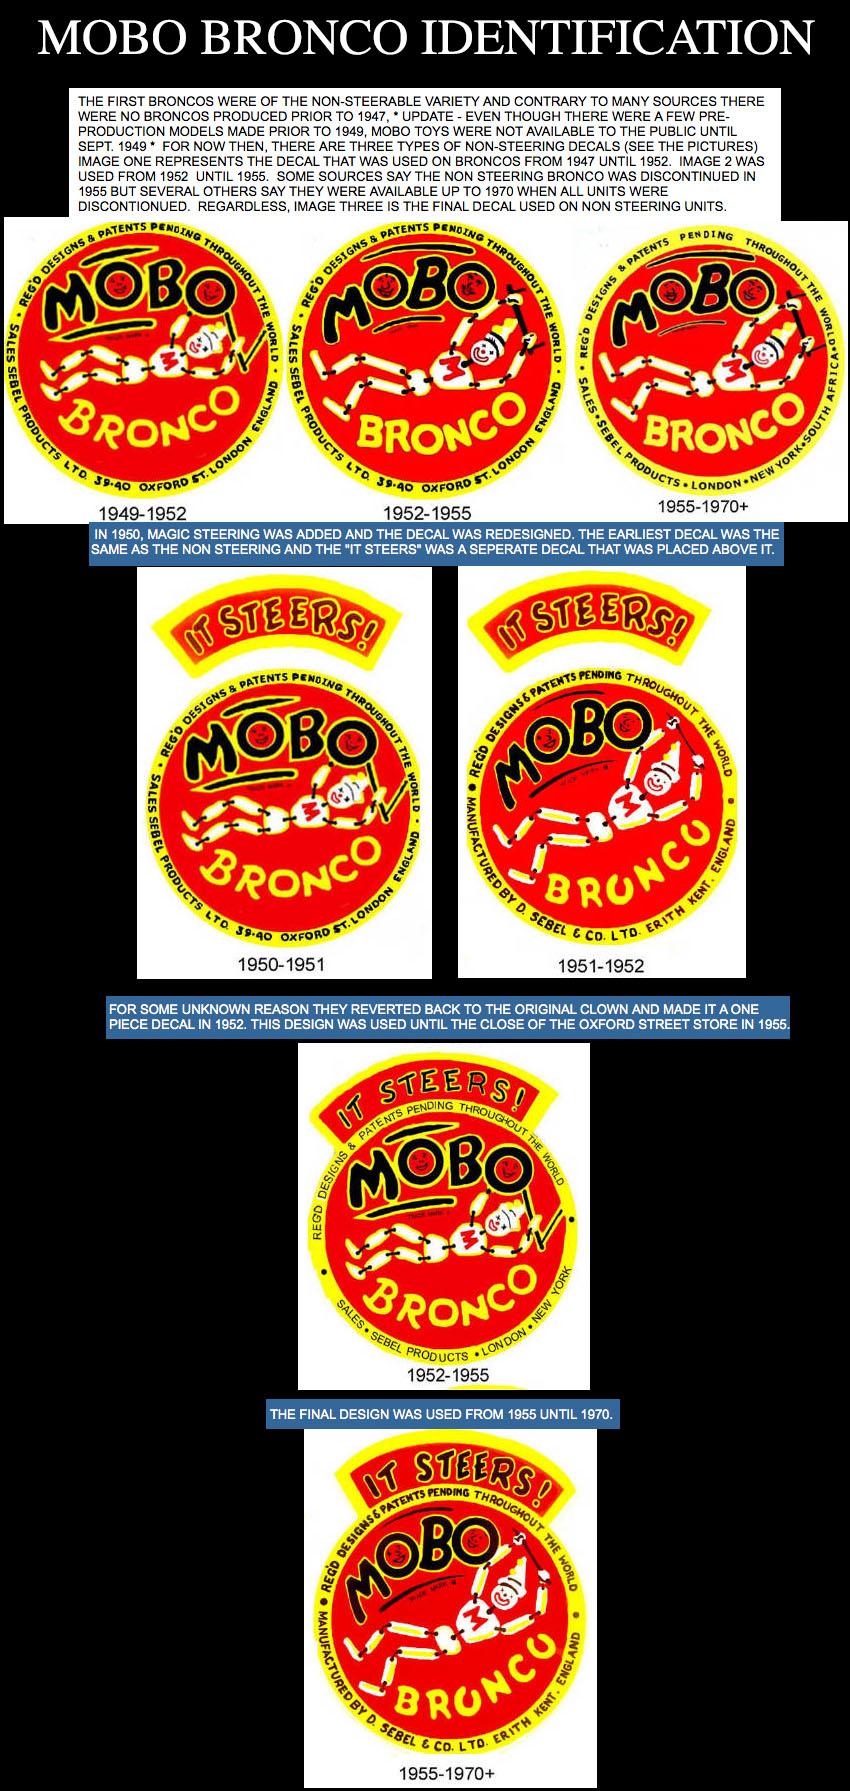 MOBO BRONCO IDENTIFICATION